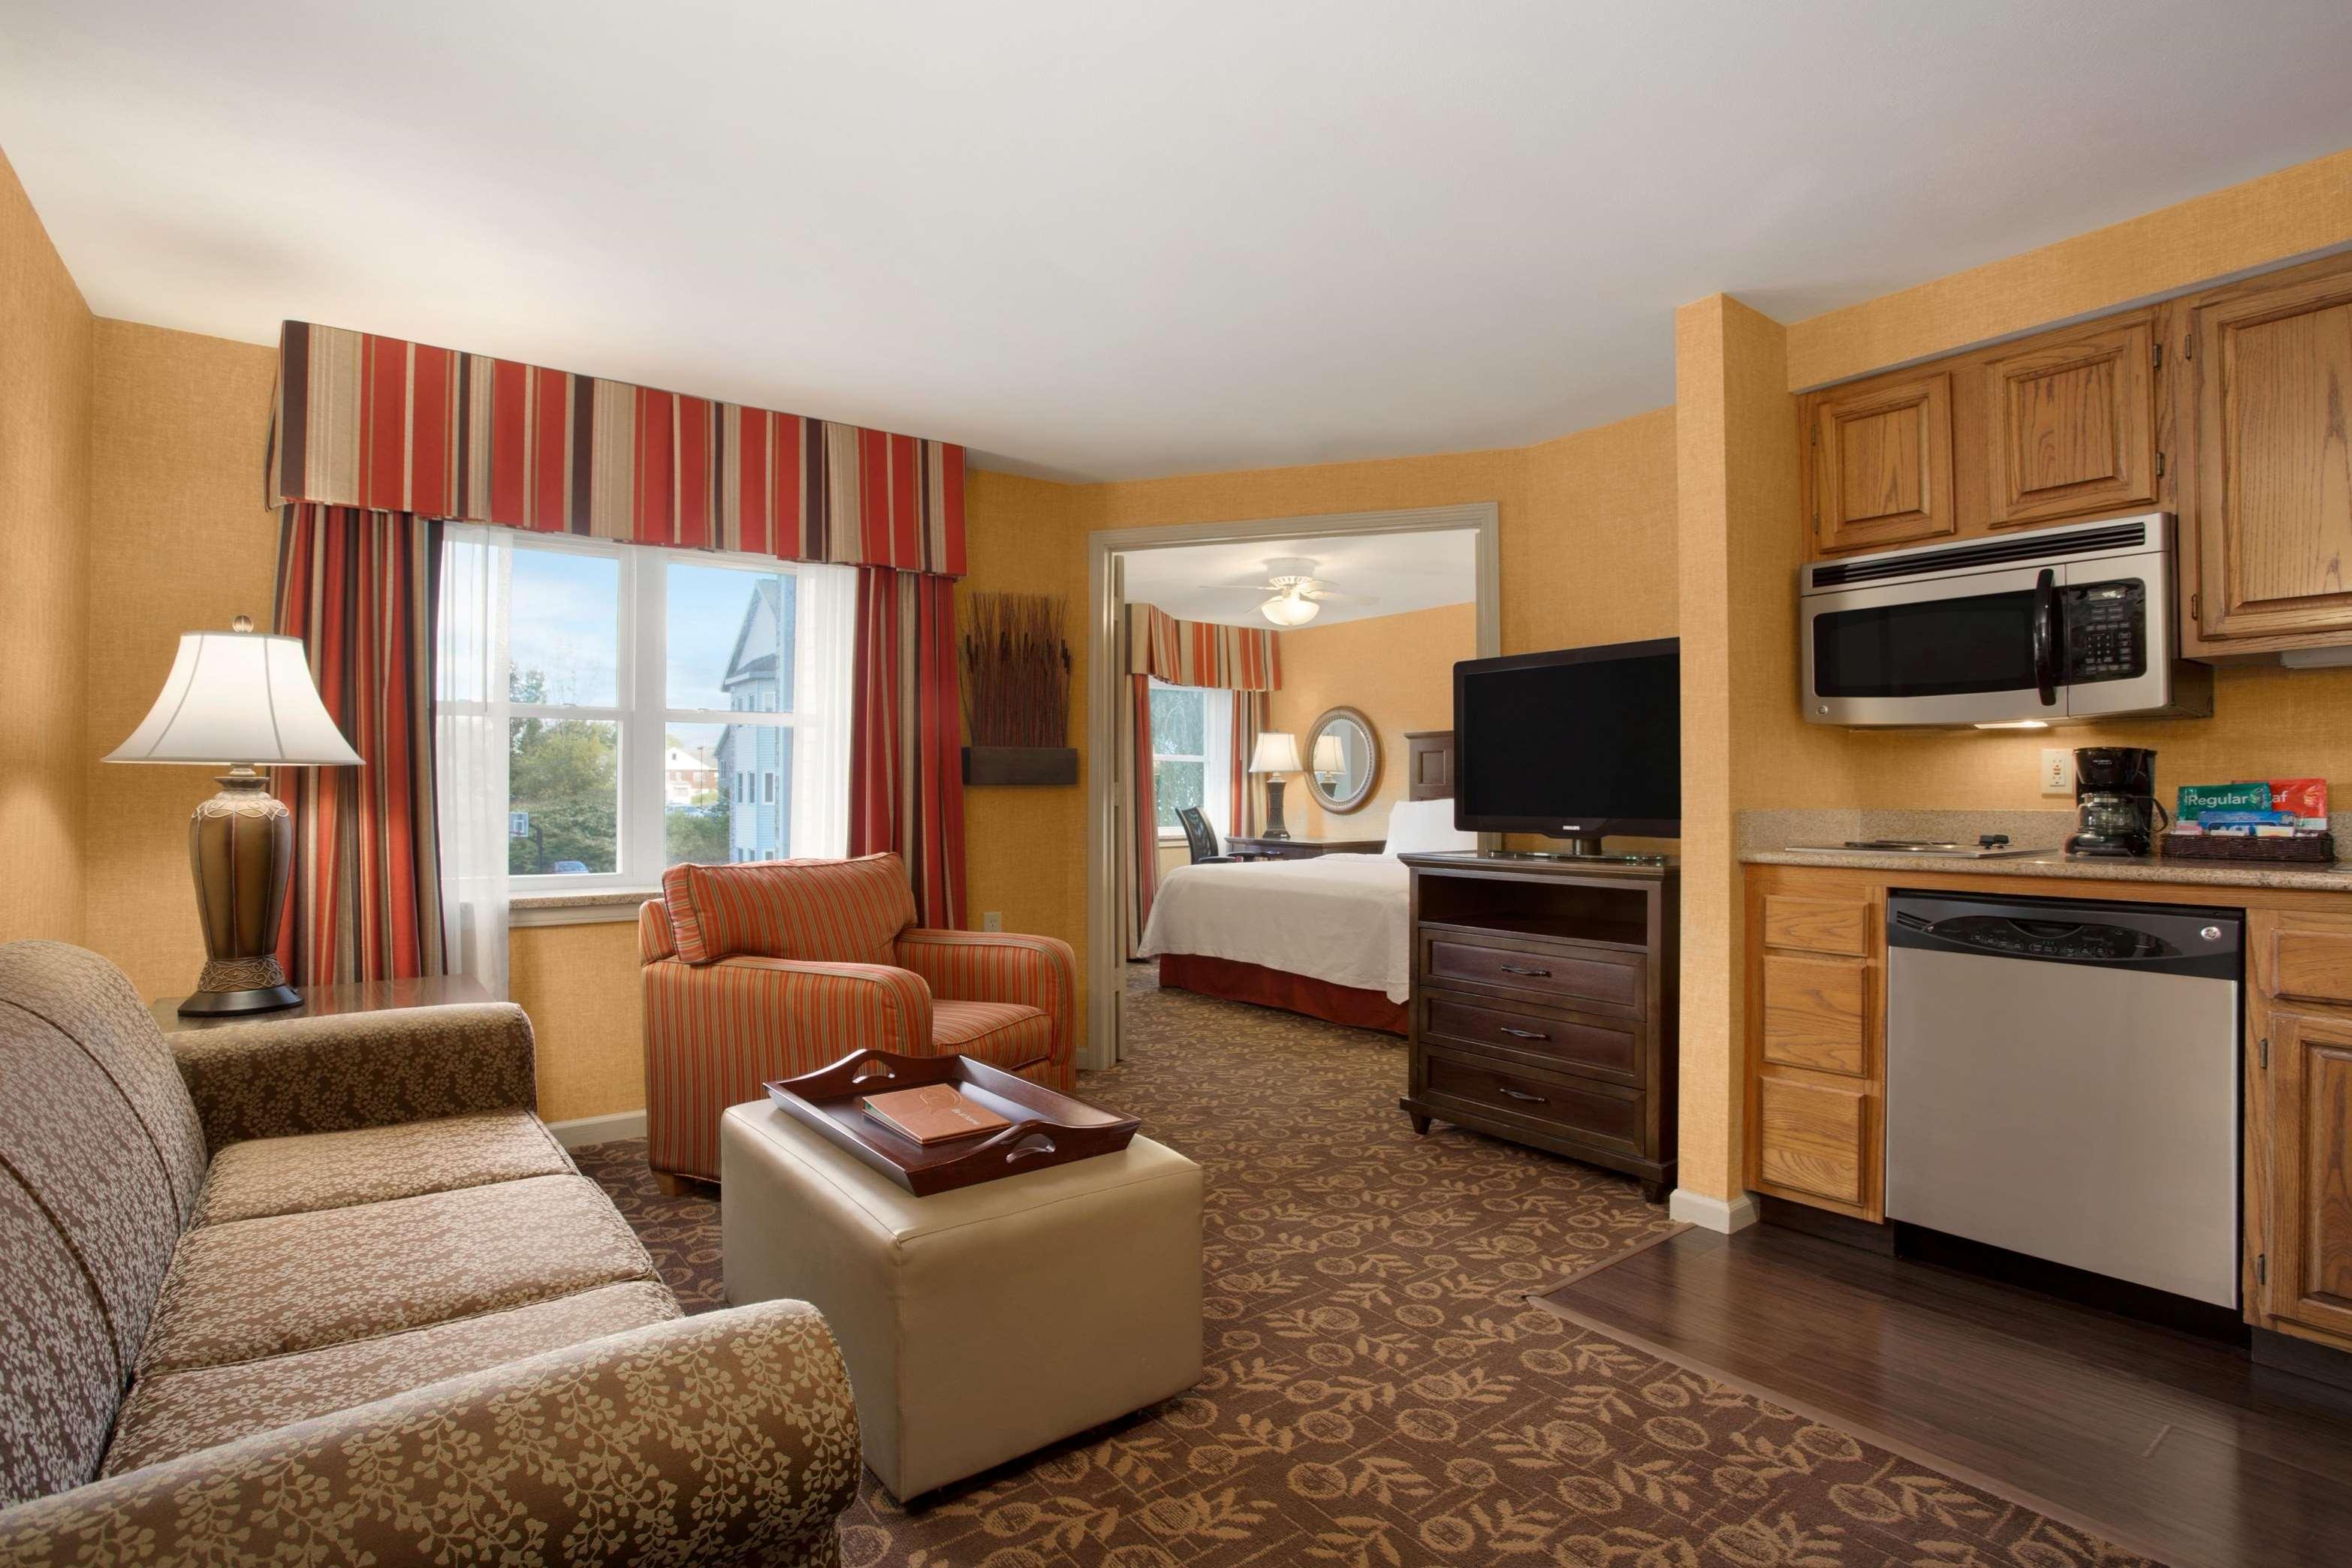 Homewood Suites by Hilton Syracuse/Liverpool image 20